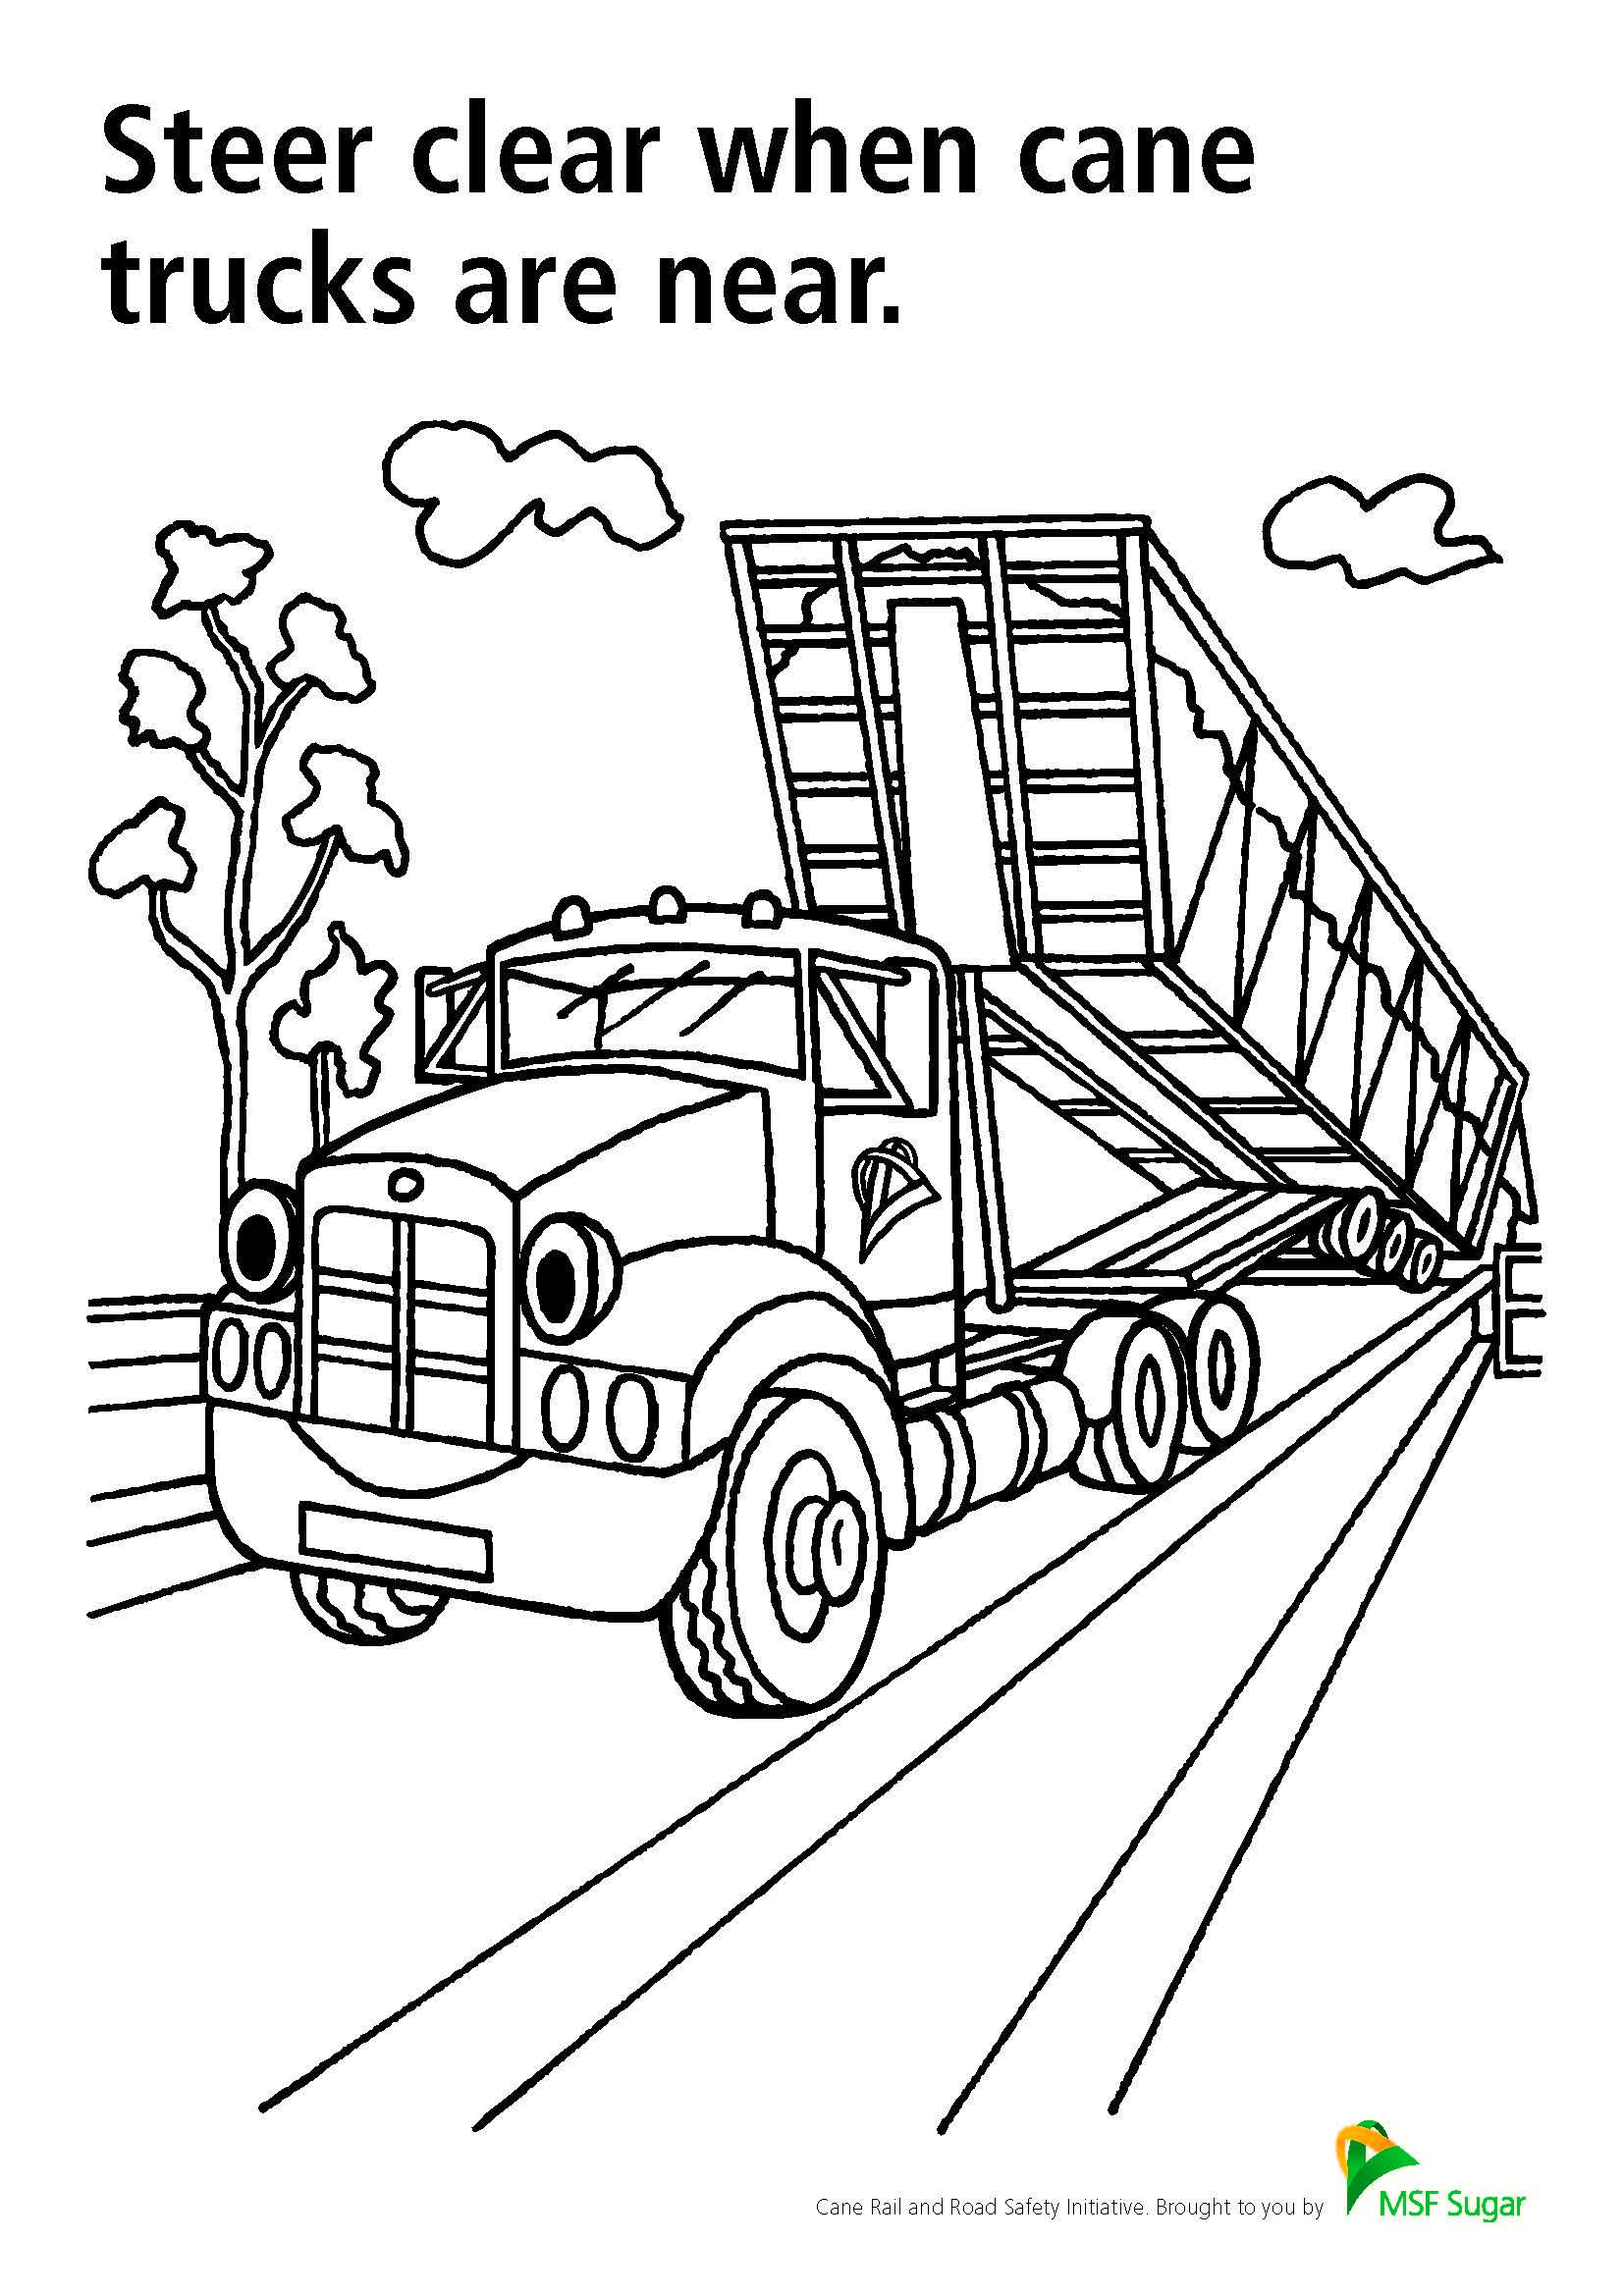 Steer clear when cane trucks are near.